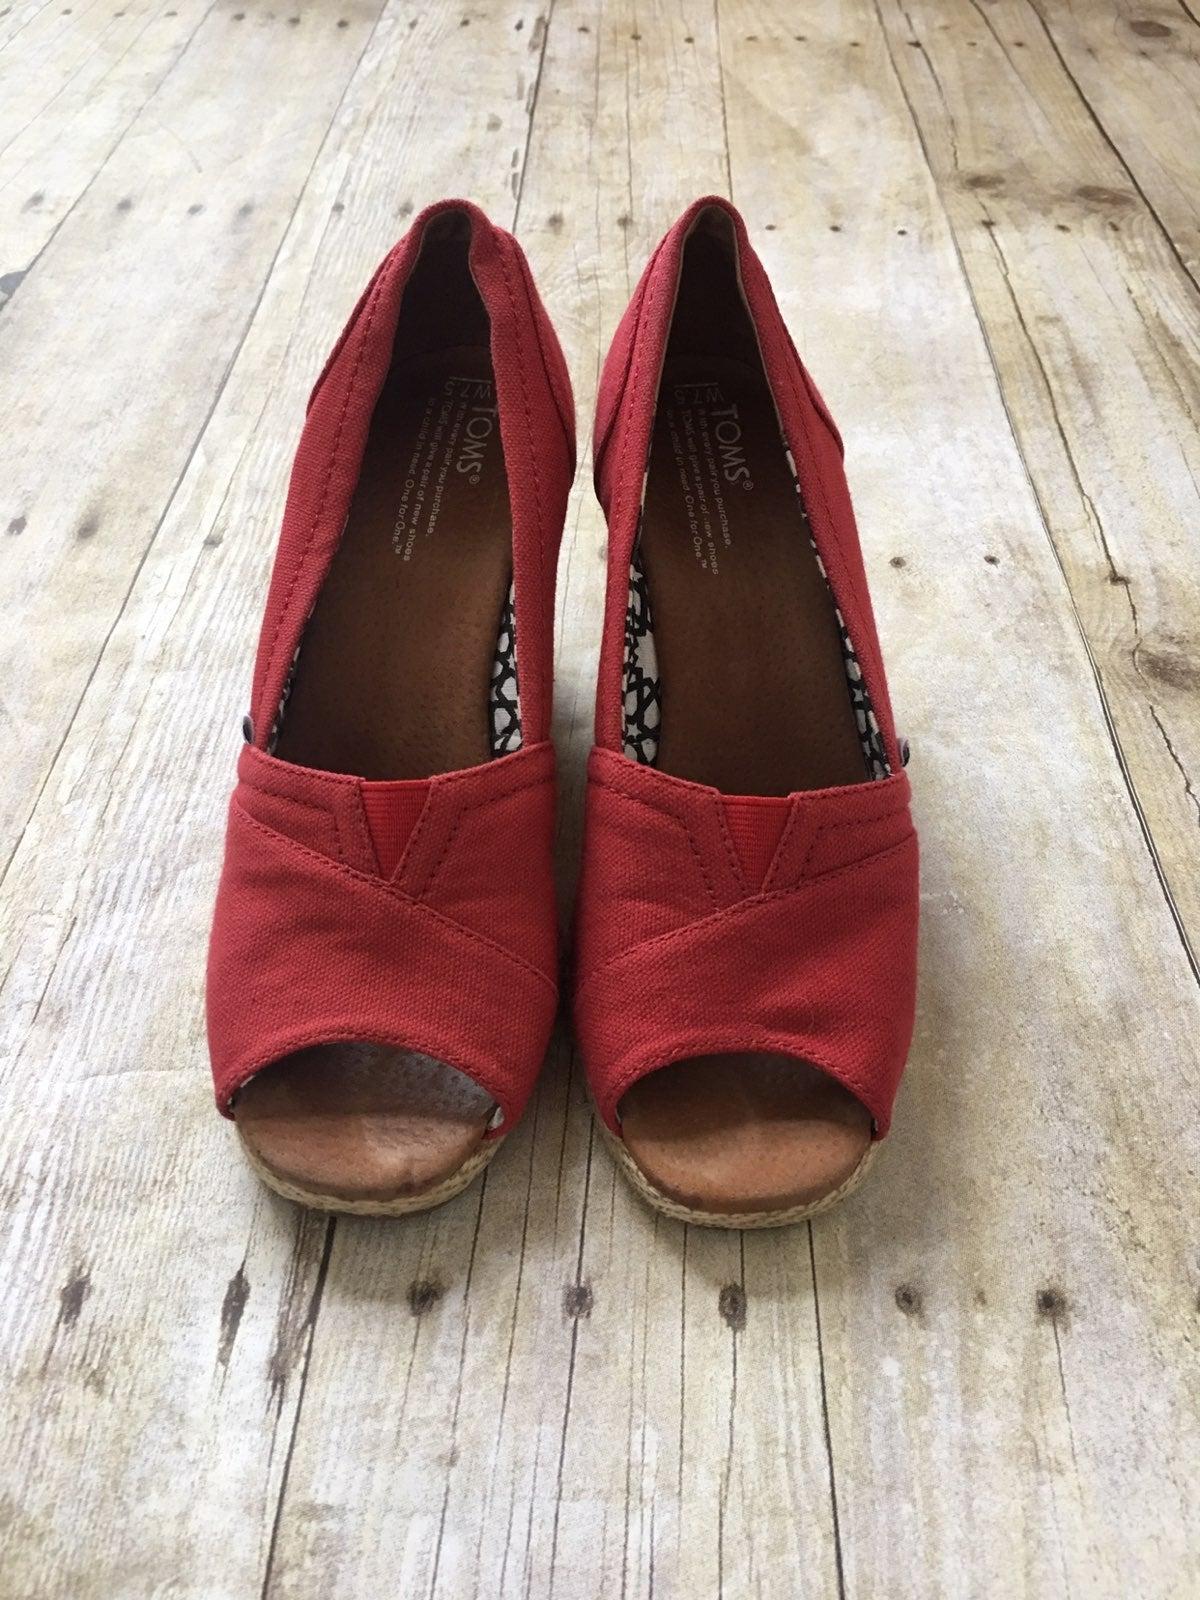 Toms Wedge Peep Toe Shoes